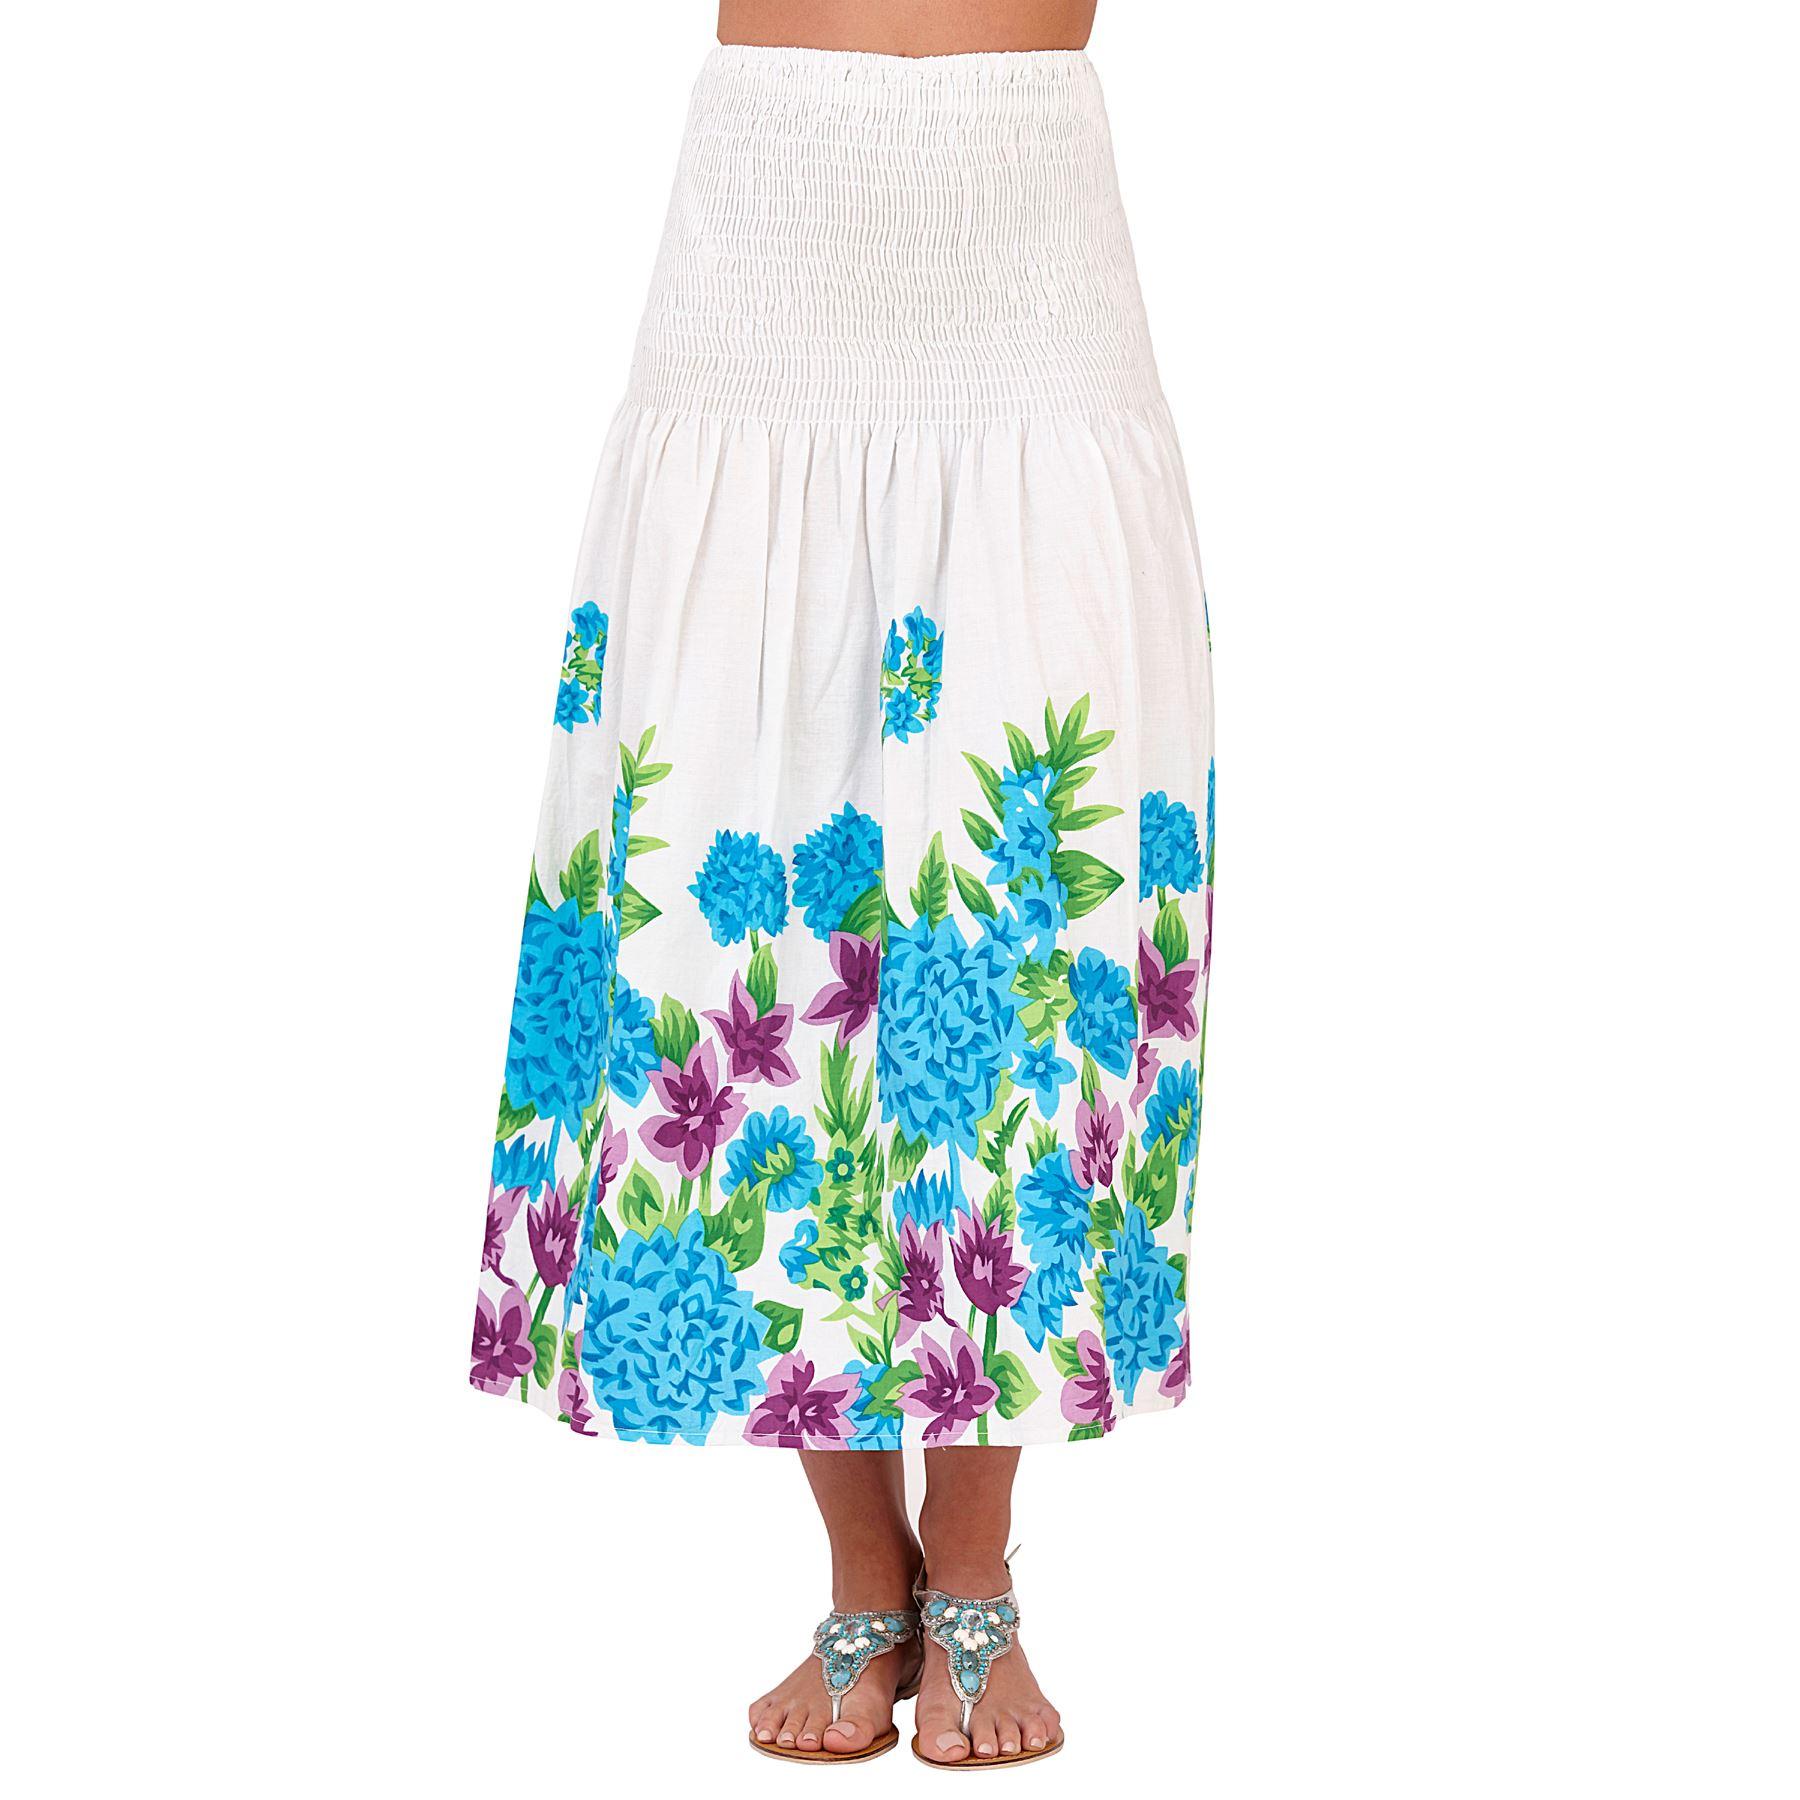 Womens Ladies Summer Beach Cotton Bandeau Strapless Dress Maxi Skirt Size 8-22